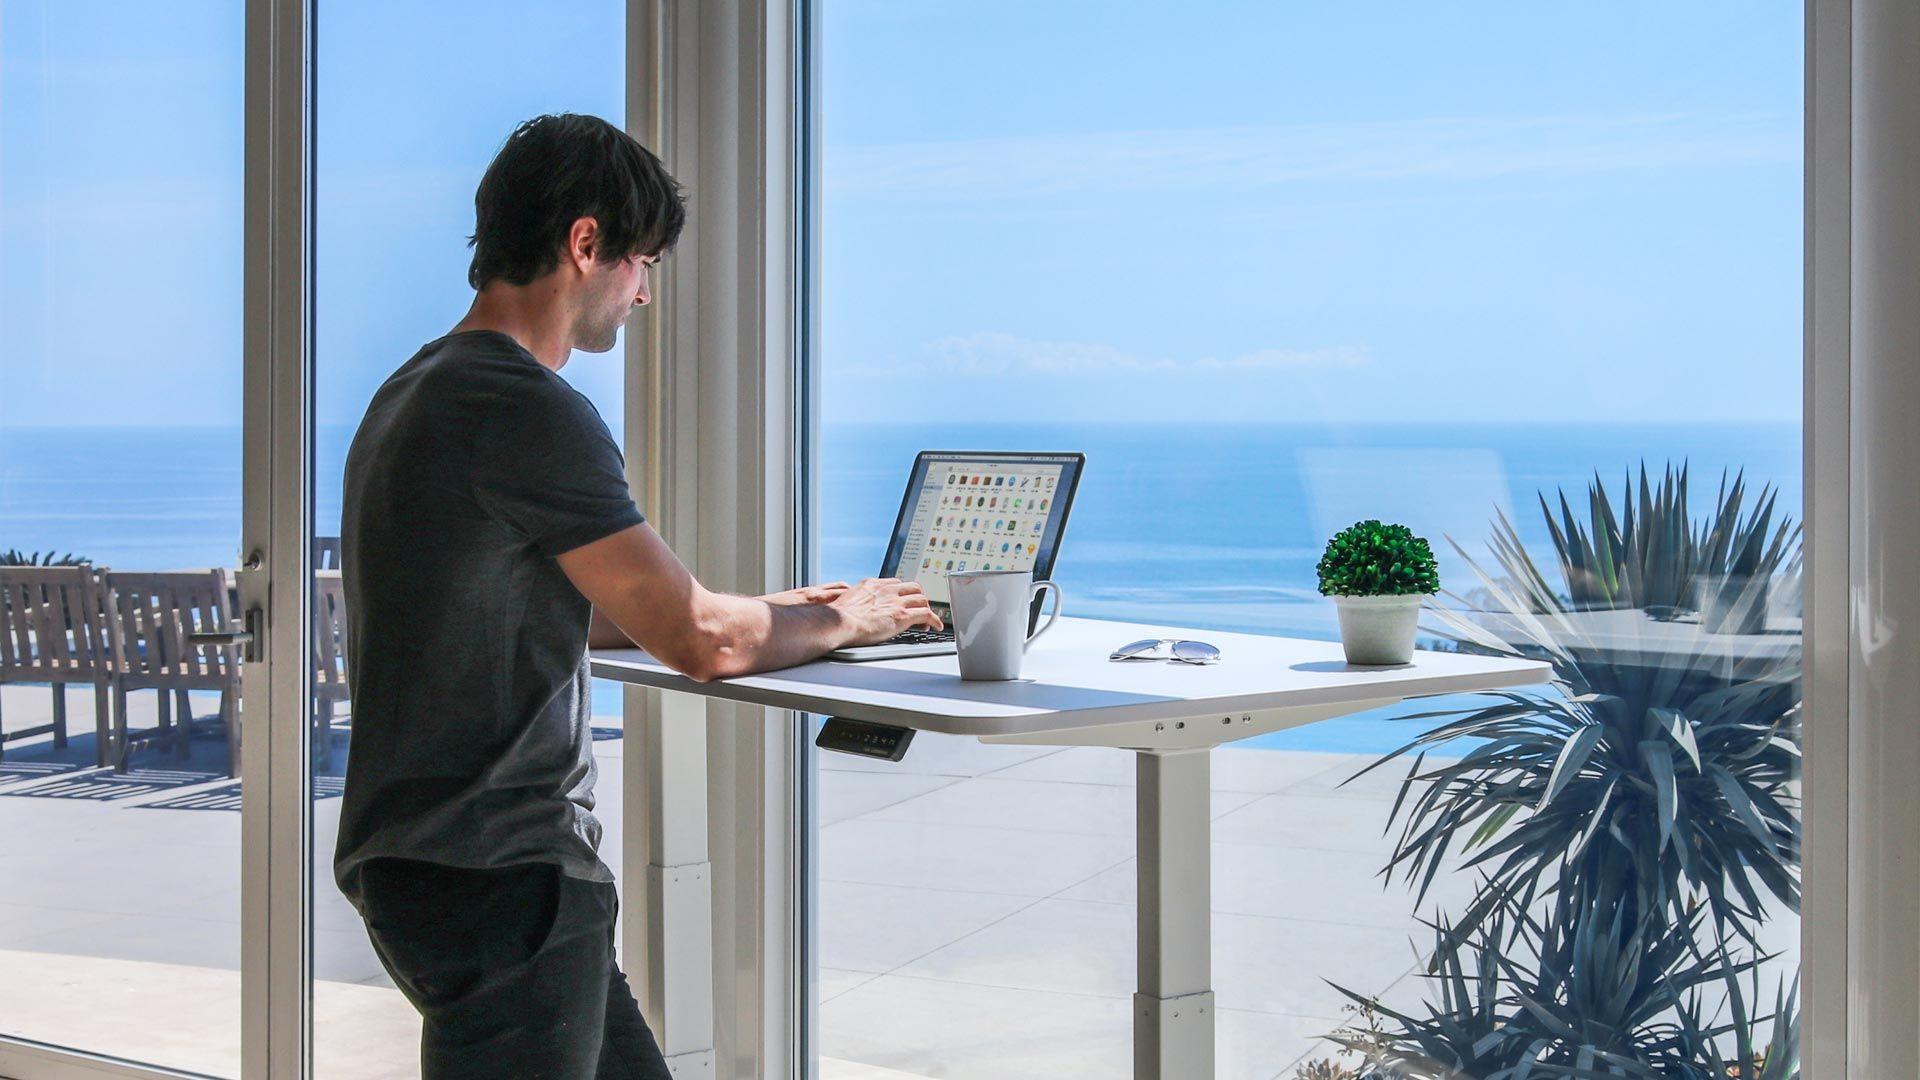 SmartDesk 2 Home Office Desk, Office gadgets